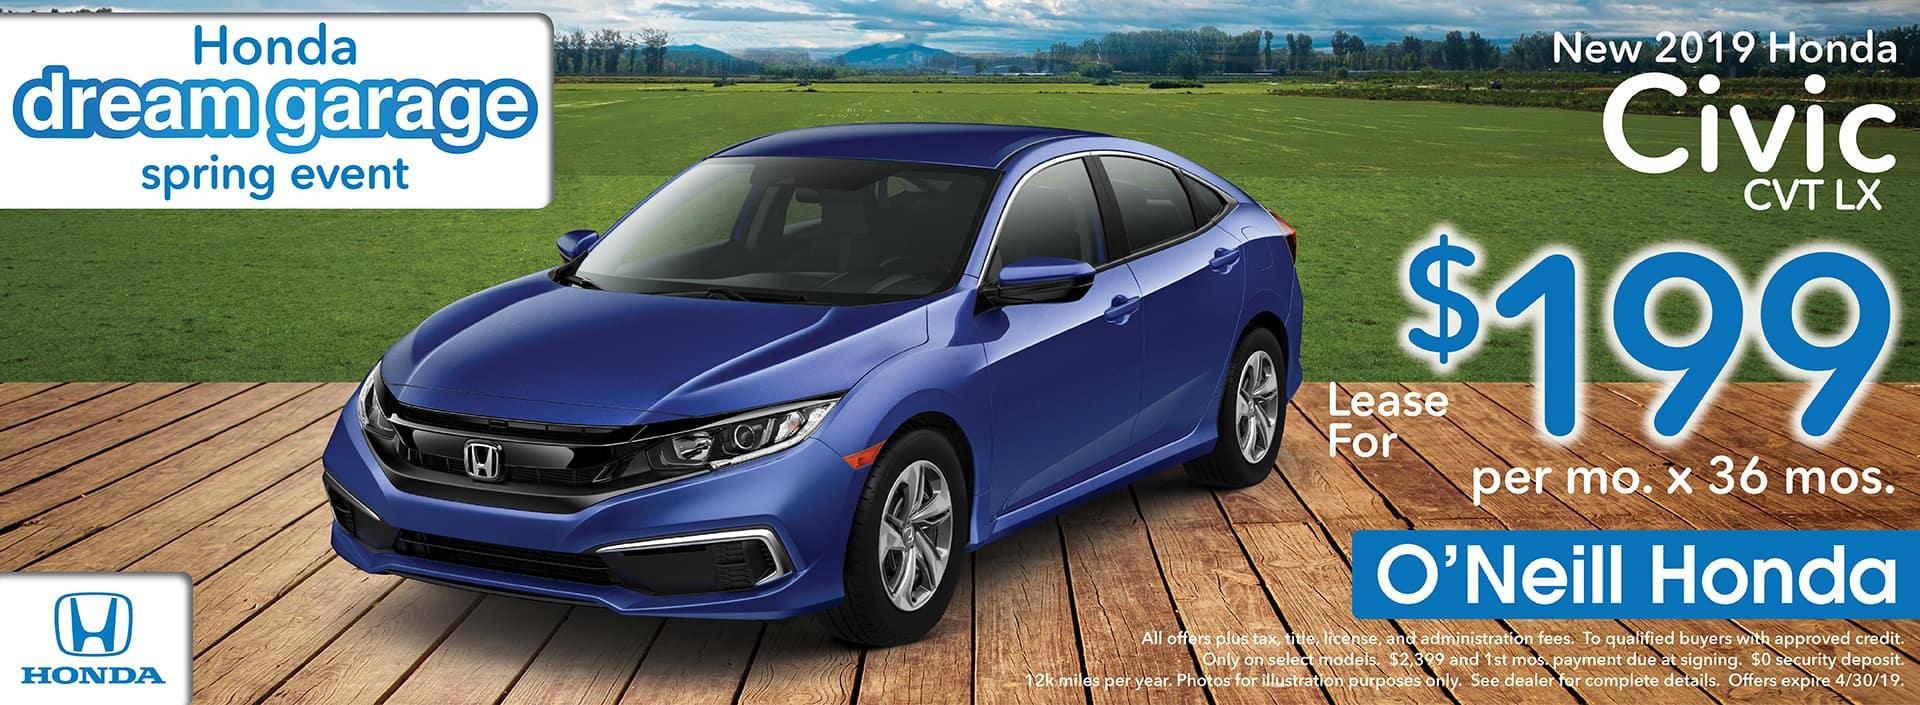 2018 Honda Civic Lease Offer